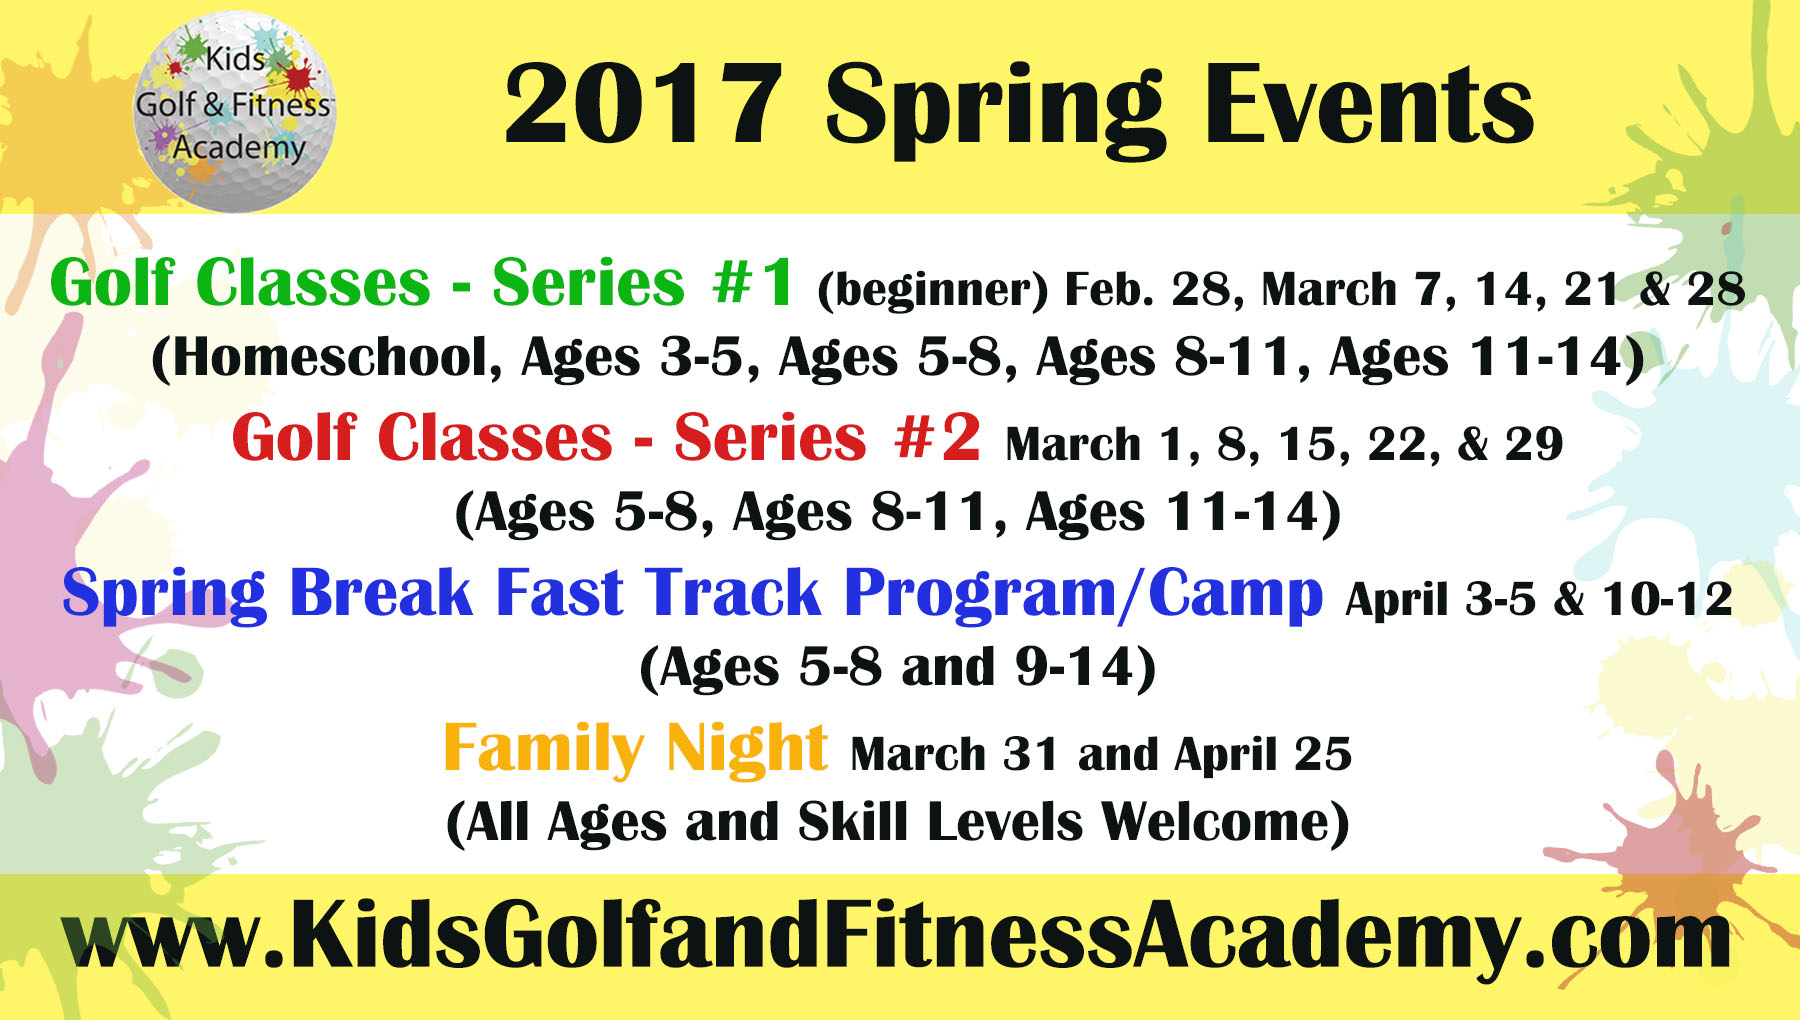 kgfa spring events